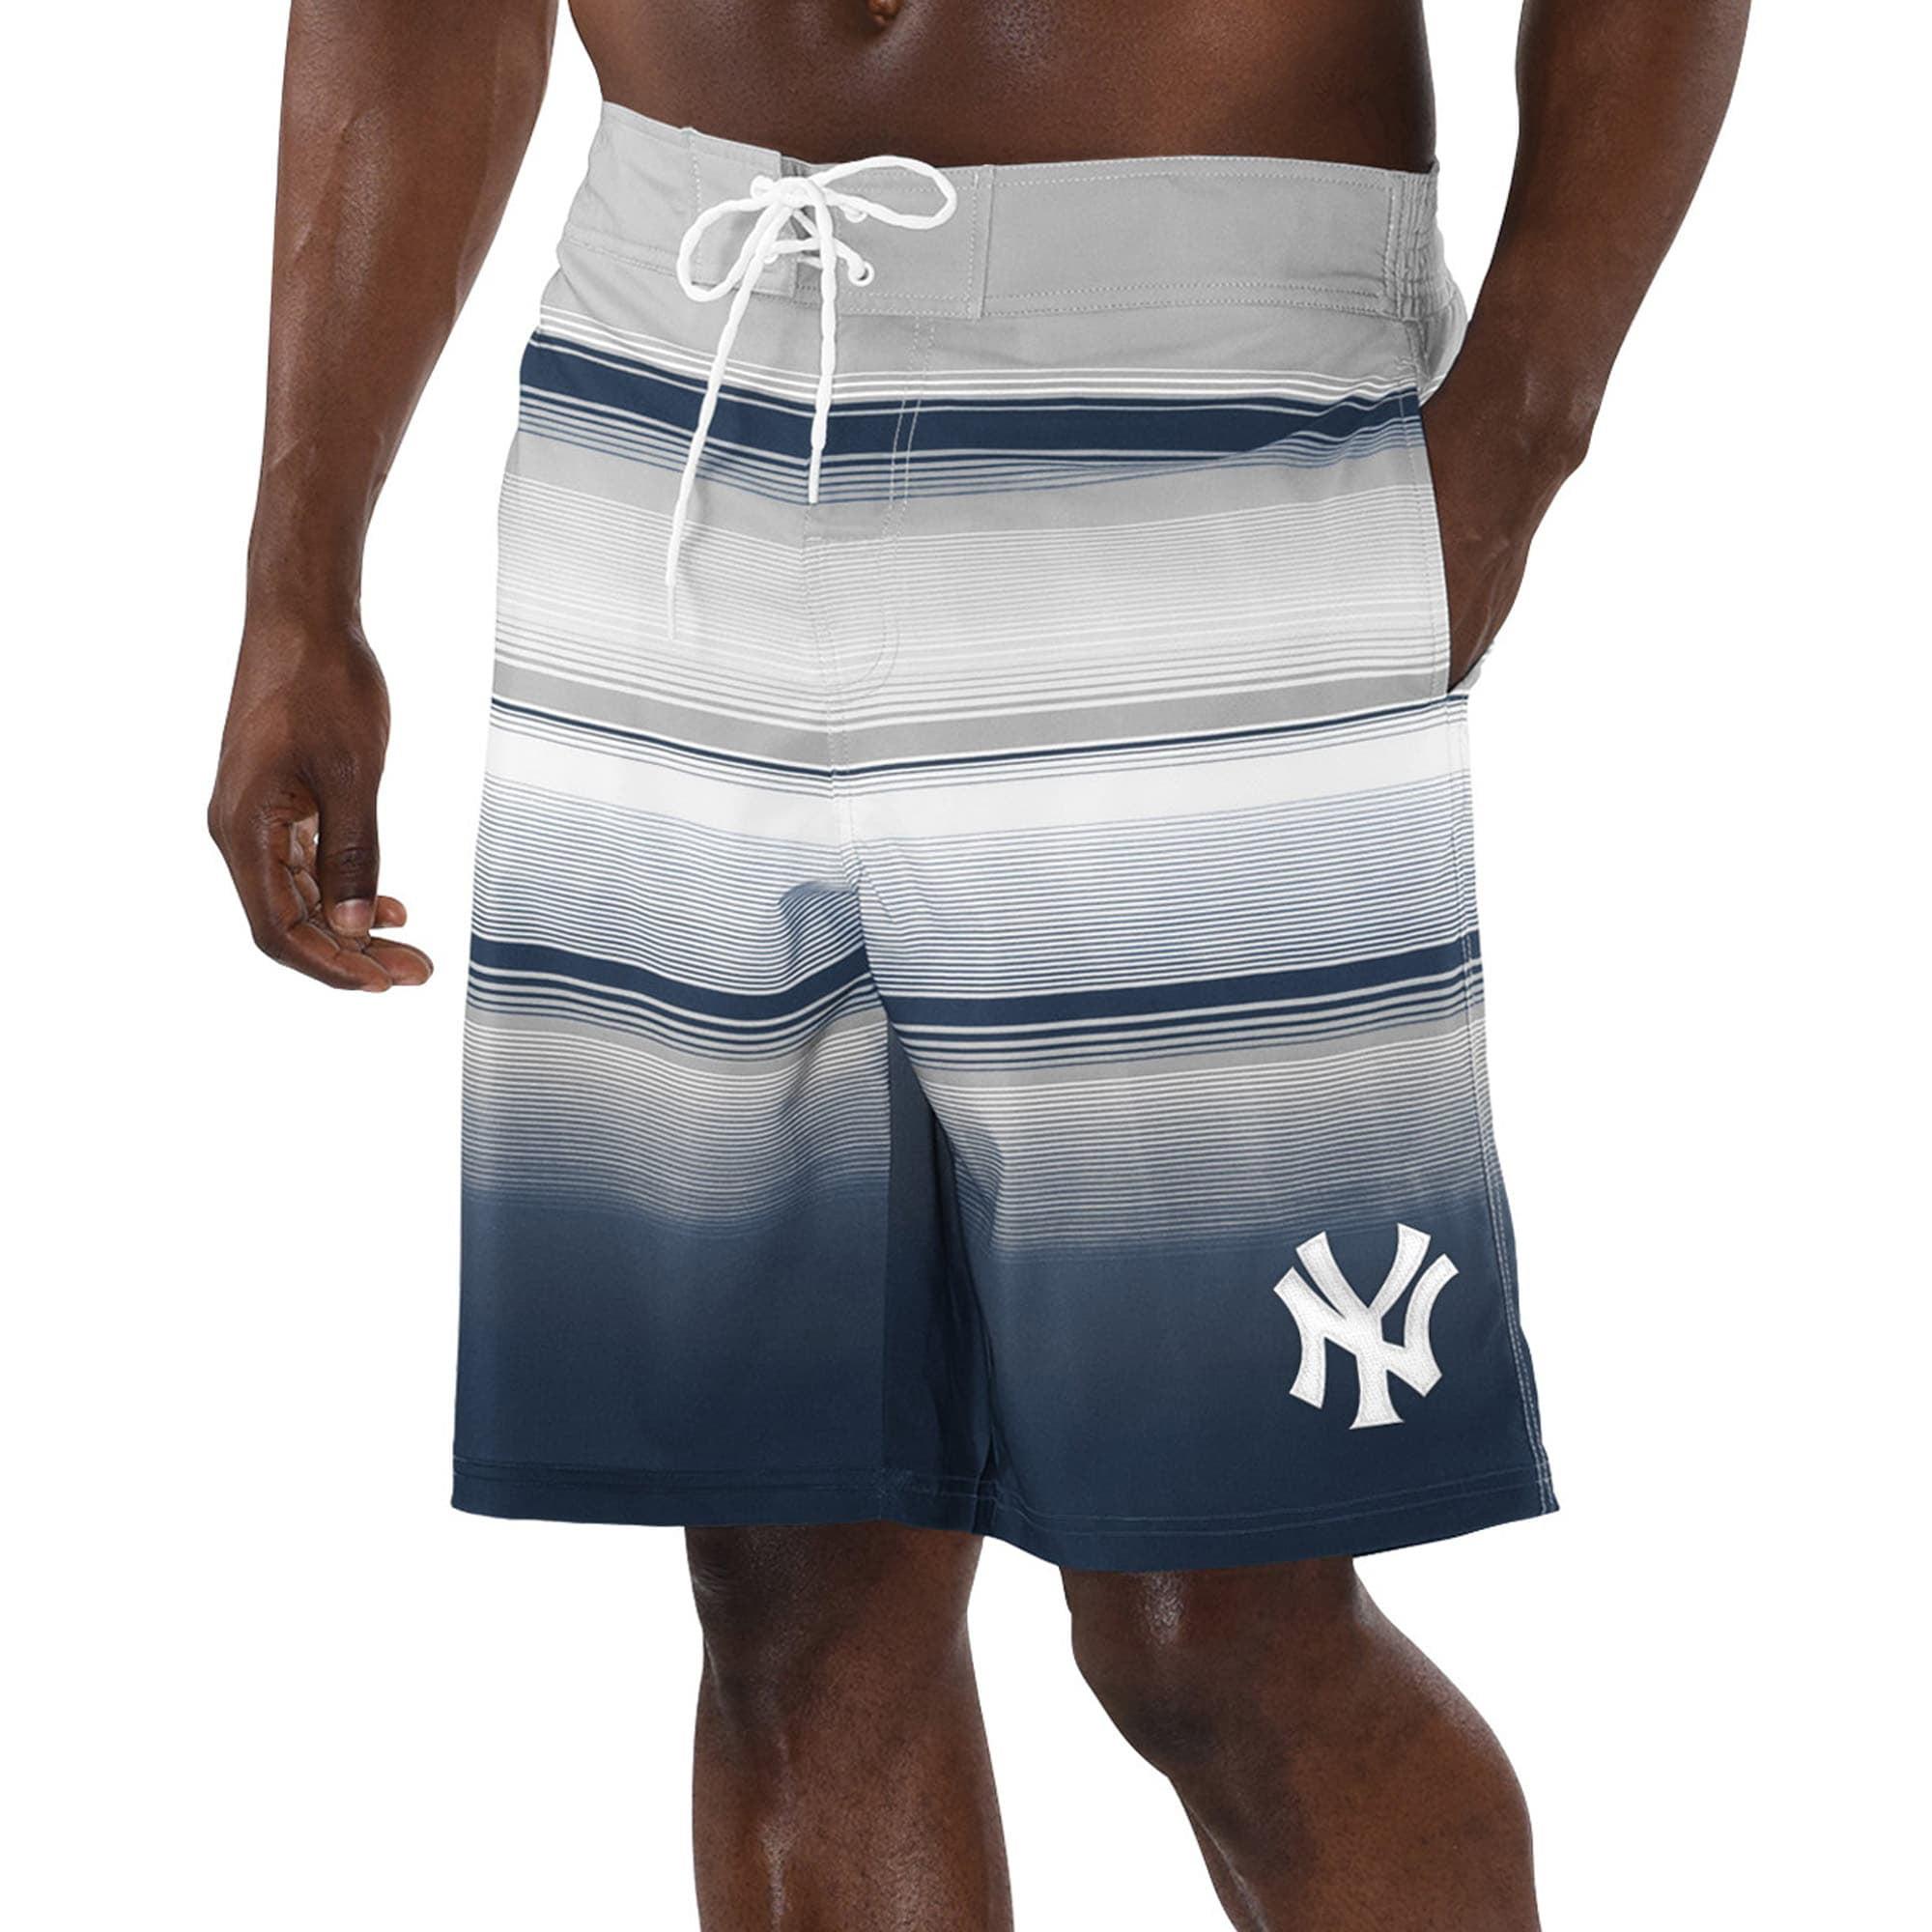 New York Yankees Boys Swimsuit Swim Trunks Shorts Baseball MLB Sz Small 5 5T NEW